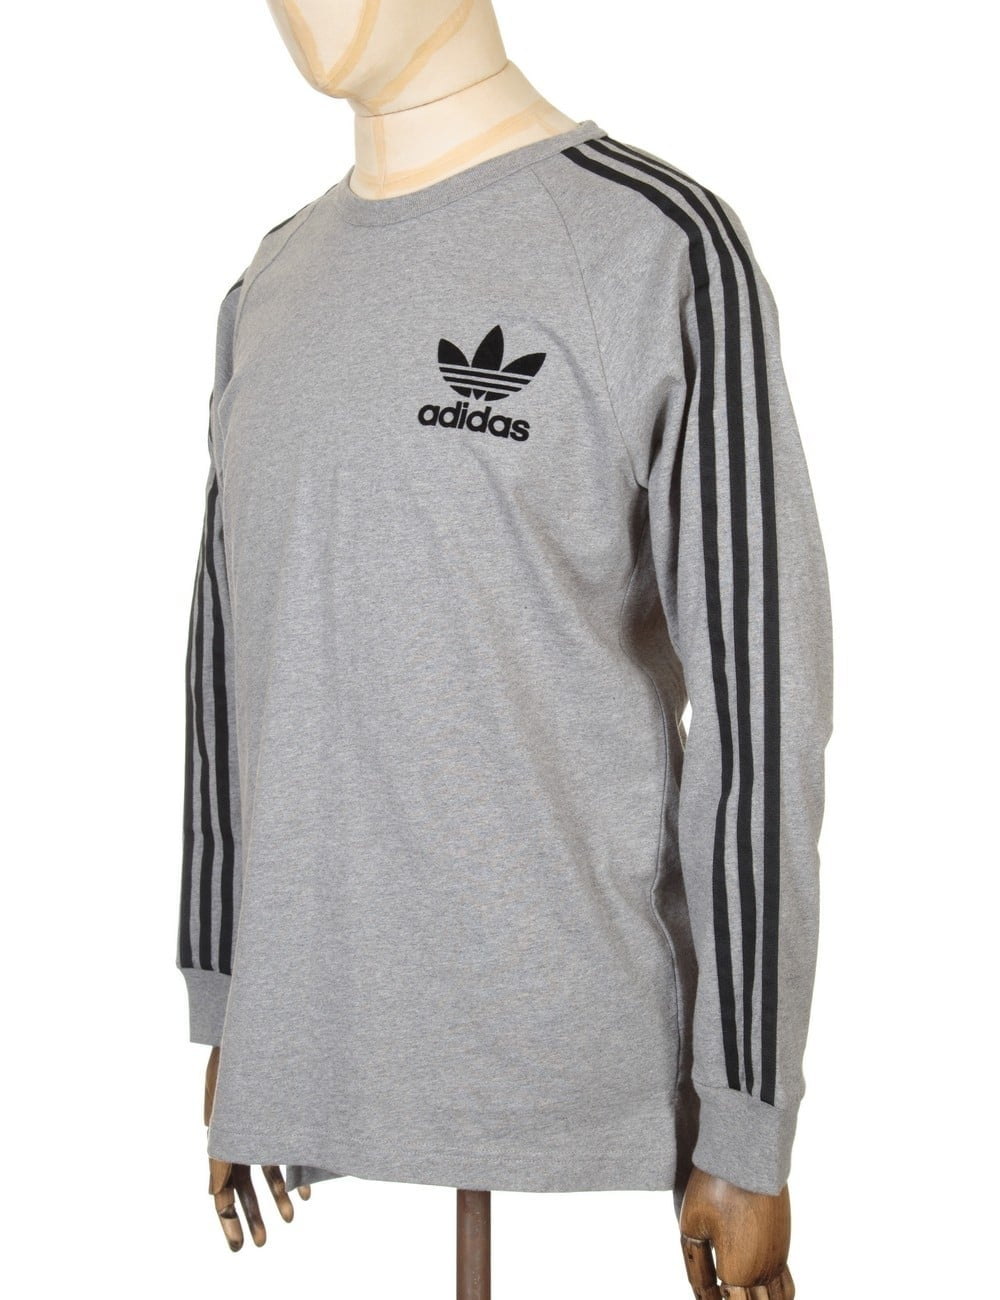 adidas originals ls retro fashion t shirt grey